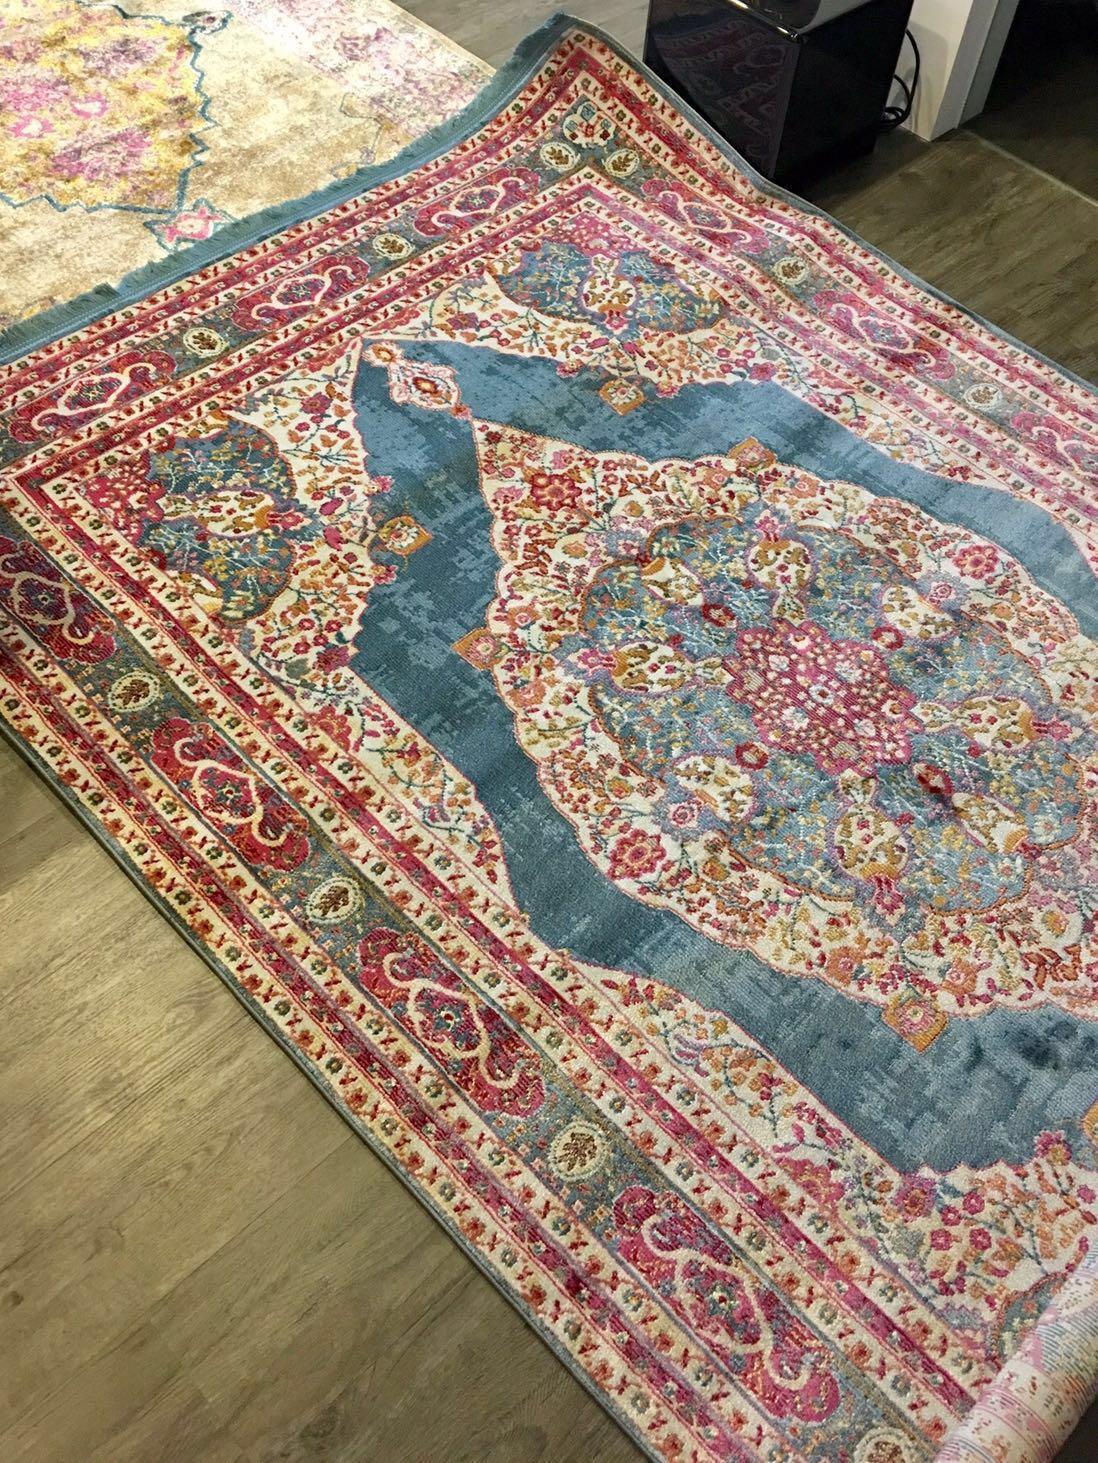 Last Piece! Brand New Instock Persian Carpet Made In Turkey